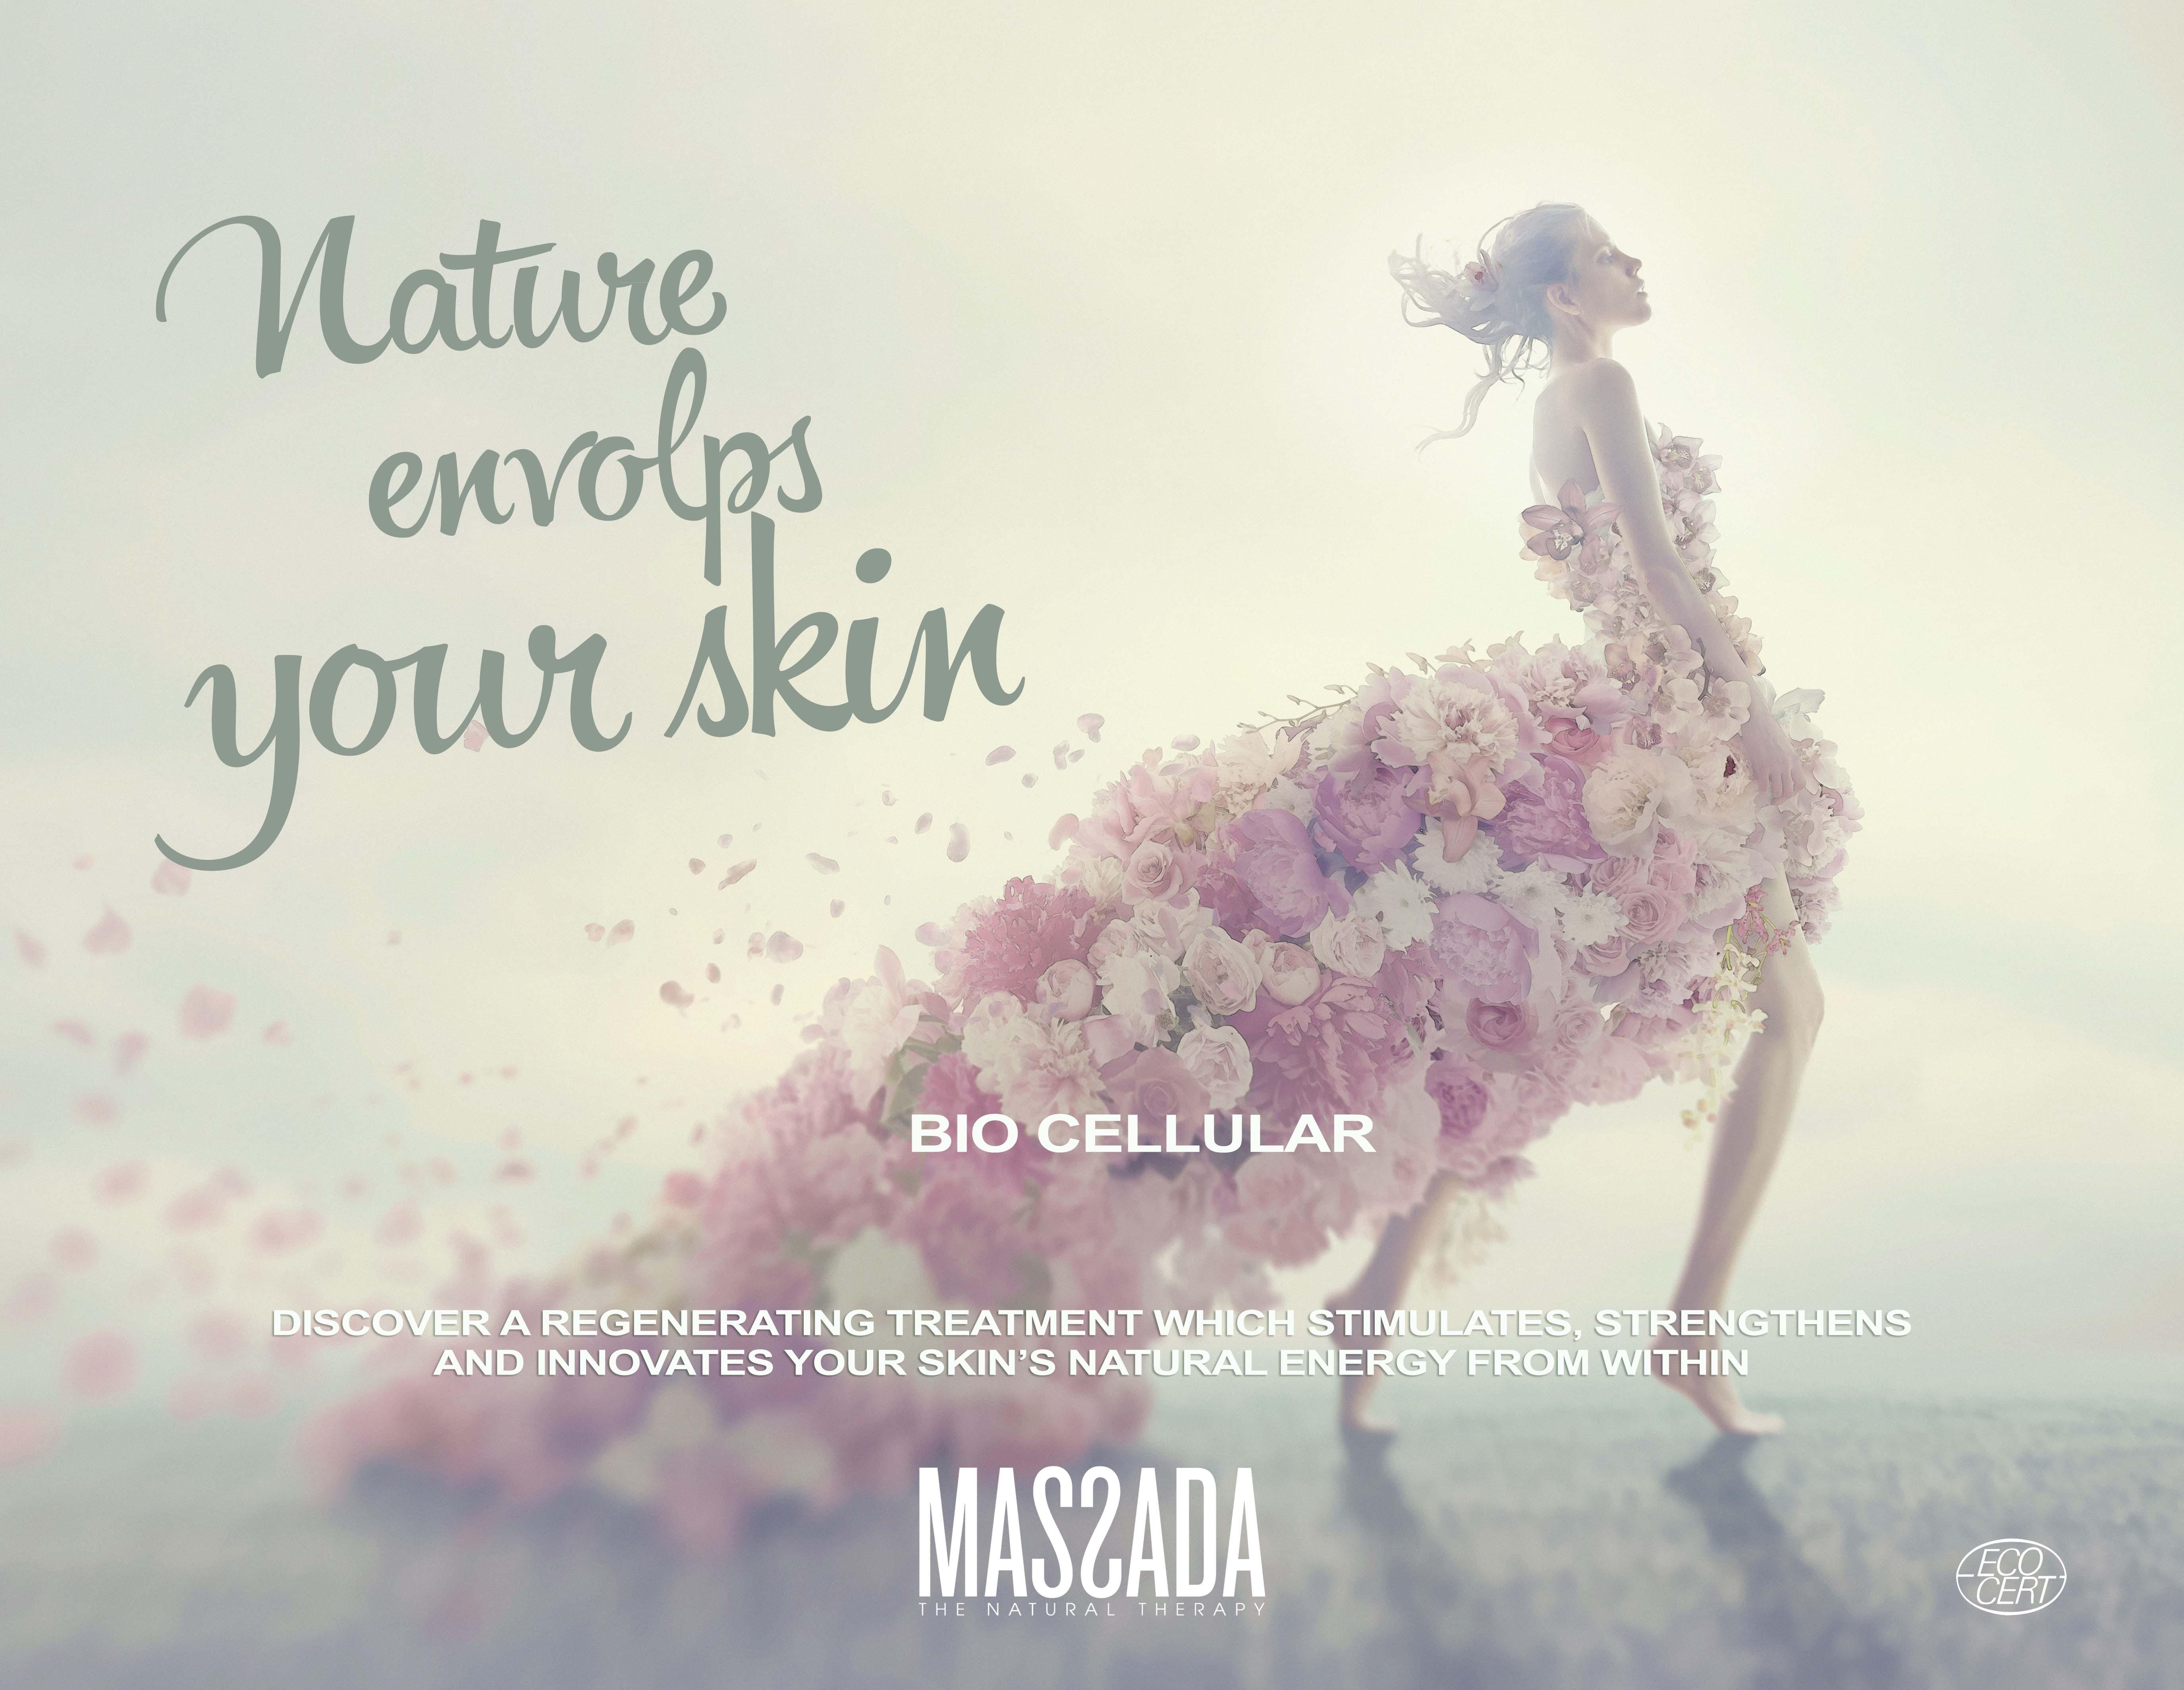 massada-biocellular-schoonheidsbehandeling-rotterdam